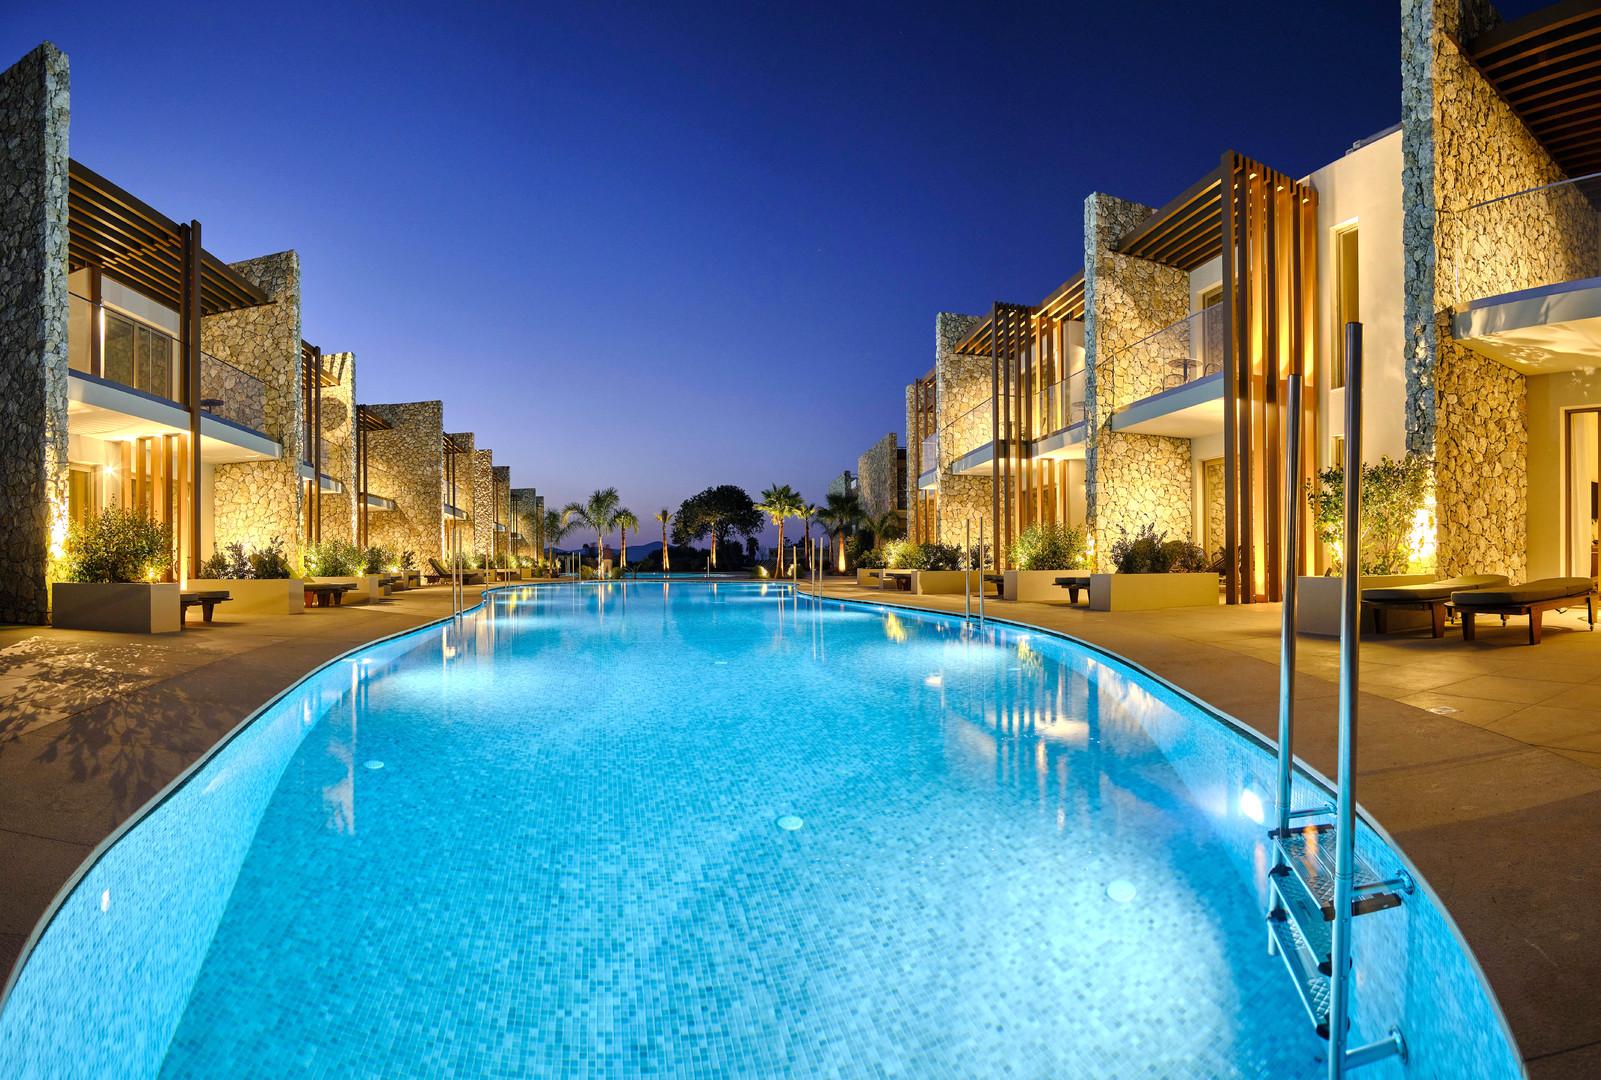 Hotel Utopia Blu #6